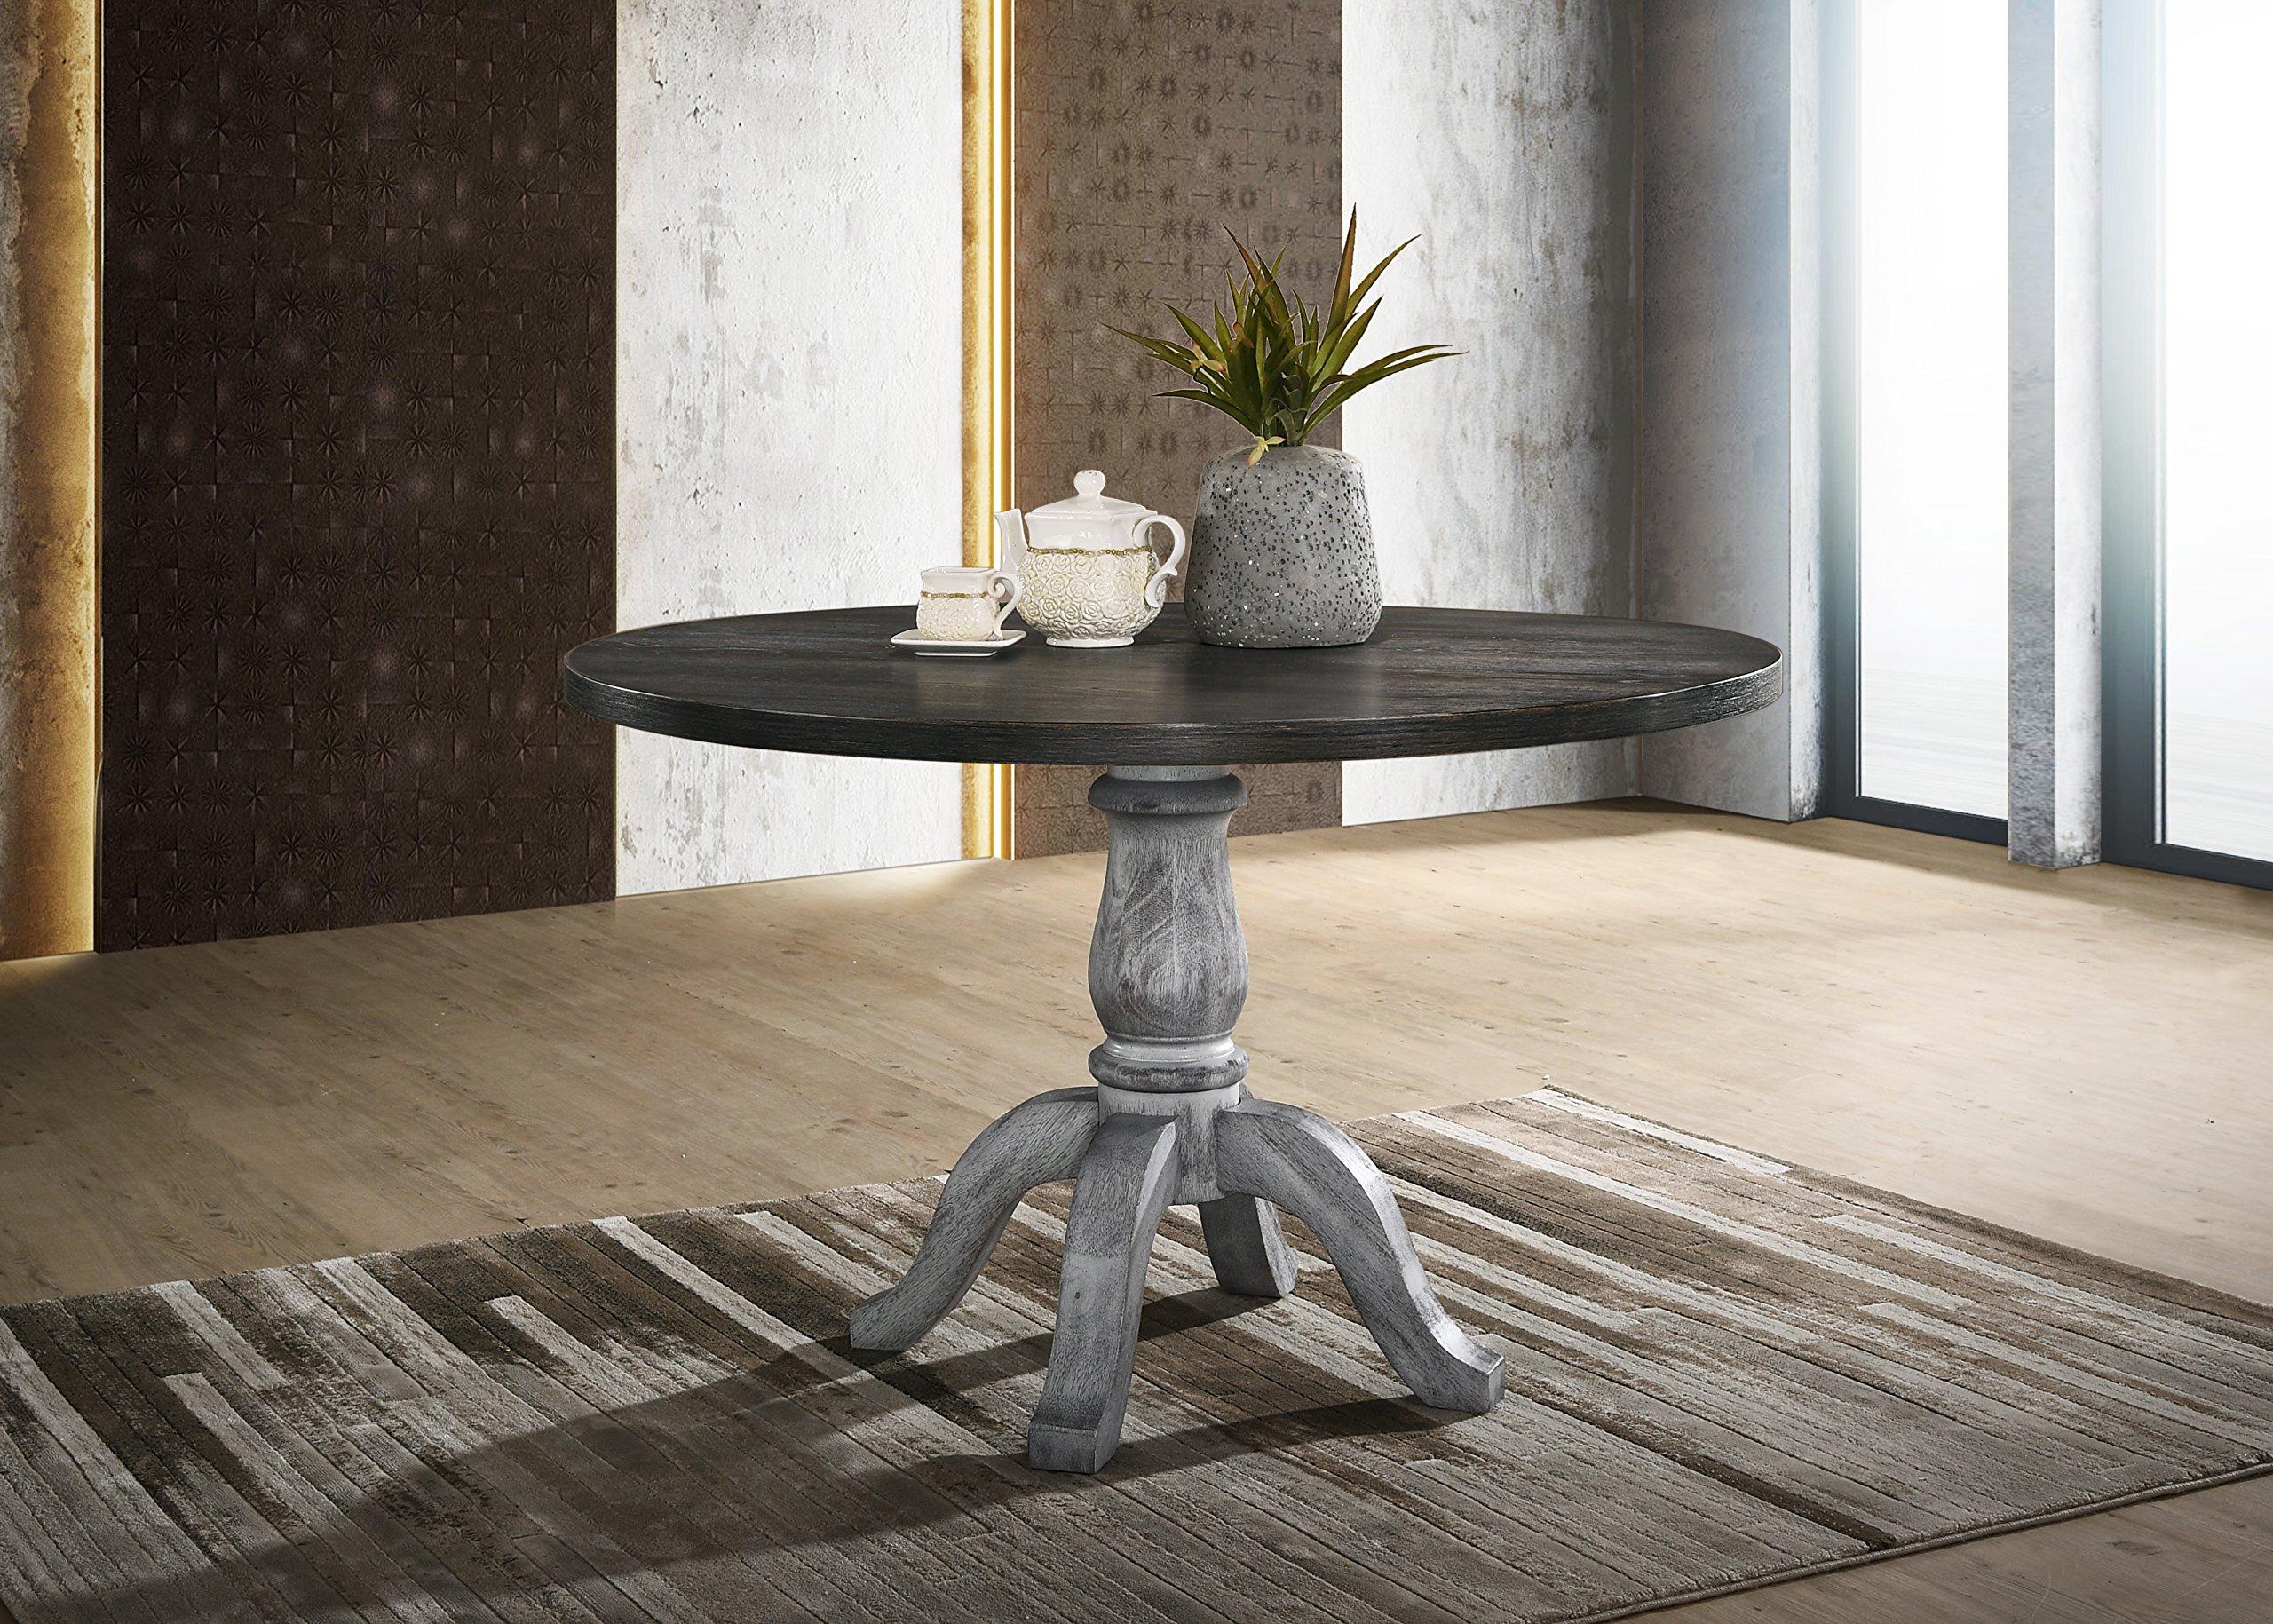 Roundhill Furniture T404 Iris Round Pedestal Wood Dining Table, Weathered White